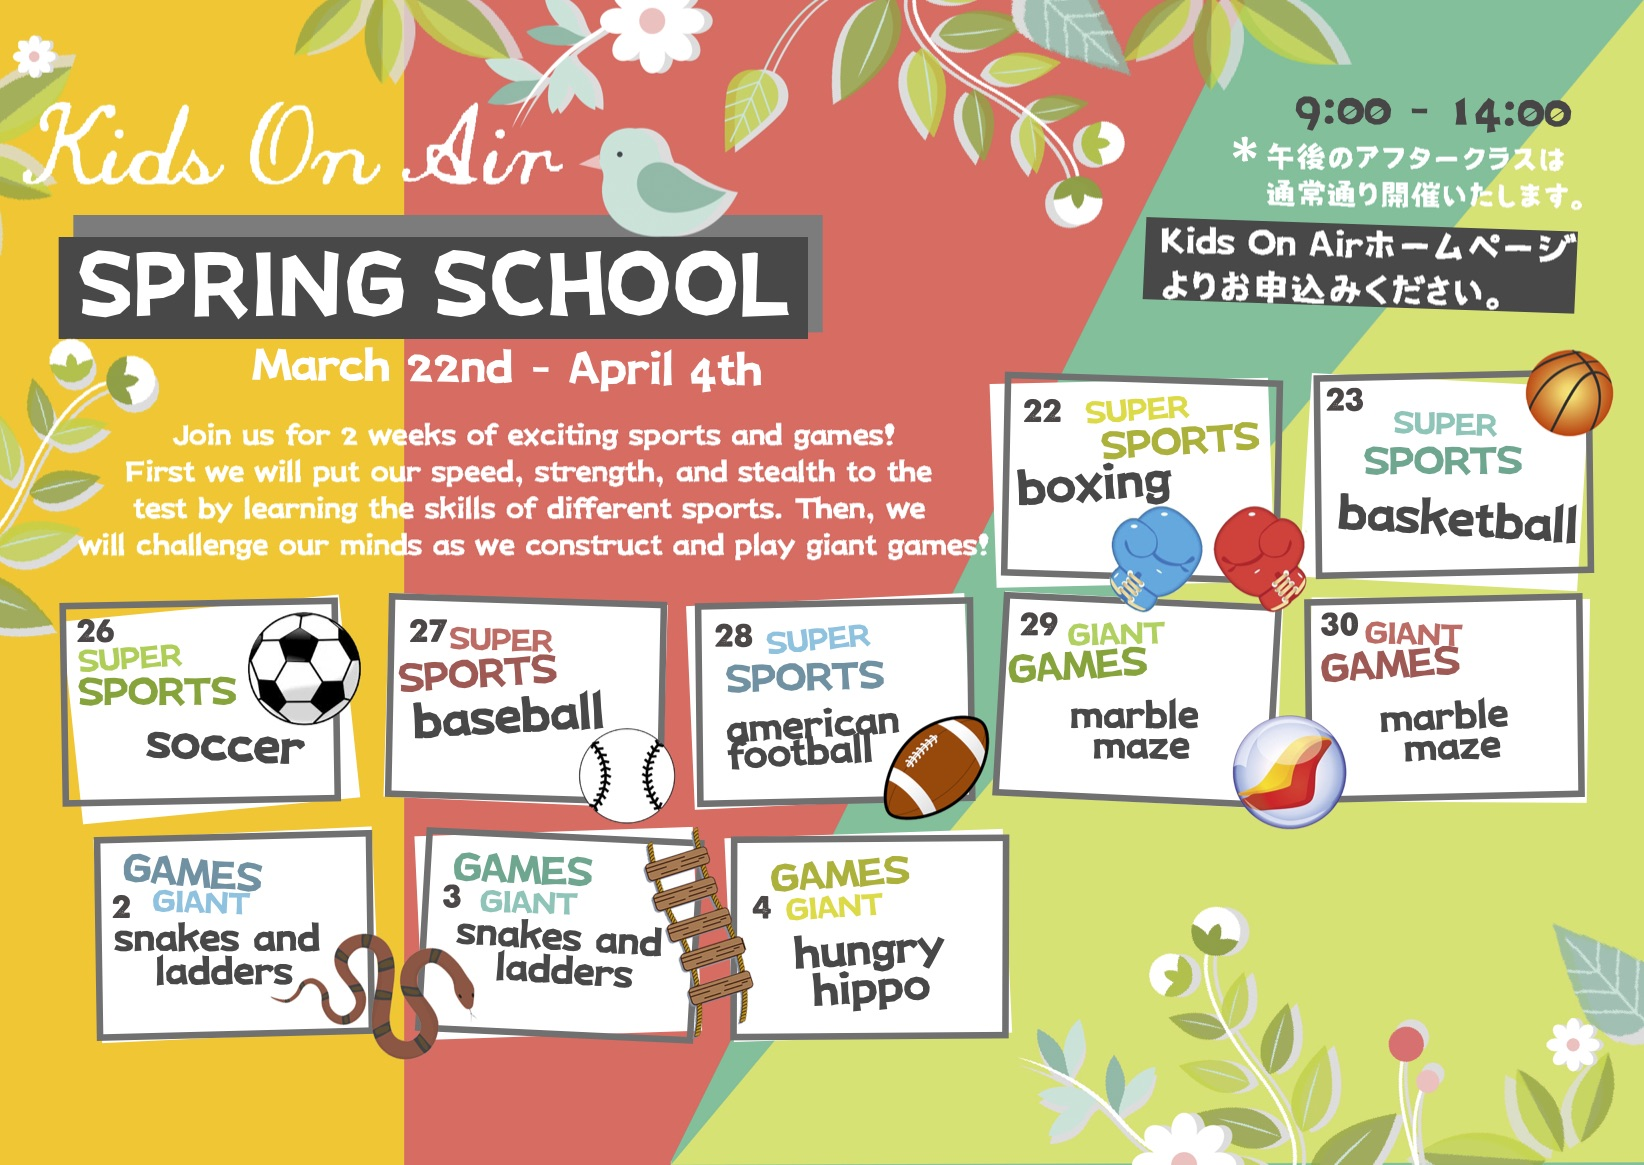 Spring School 2018 - Details